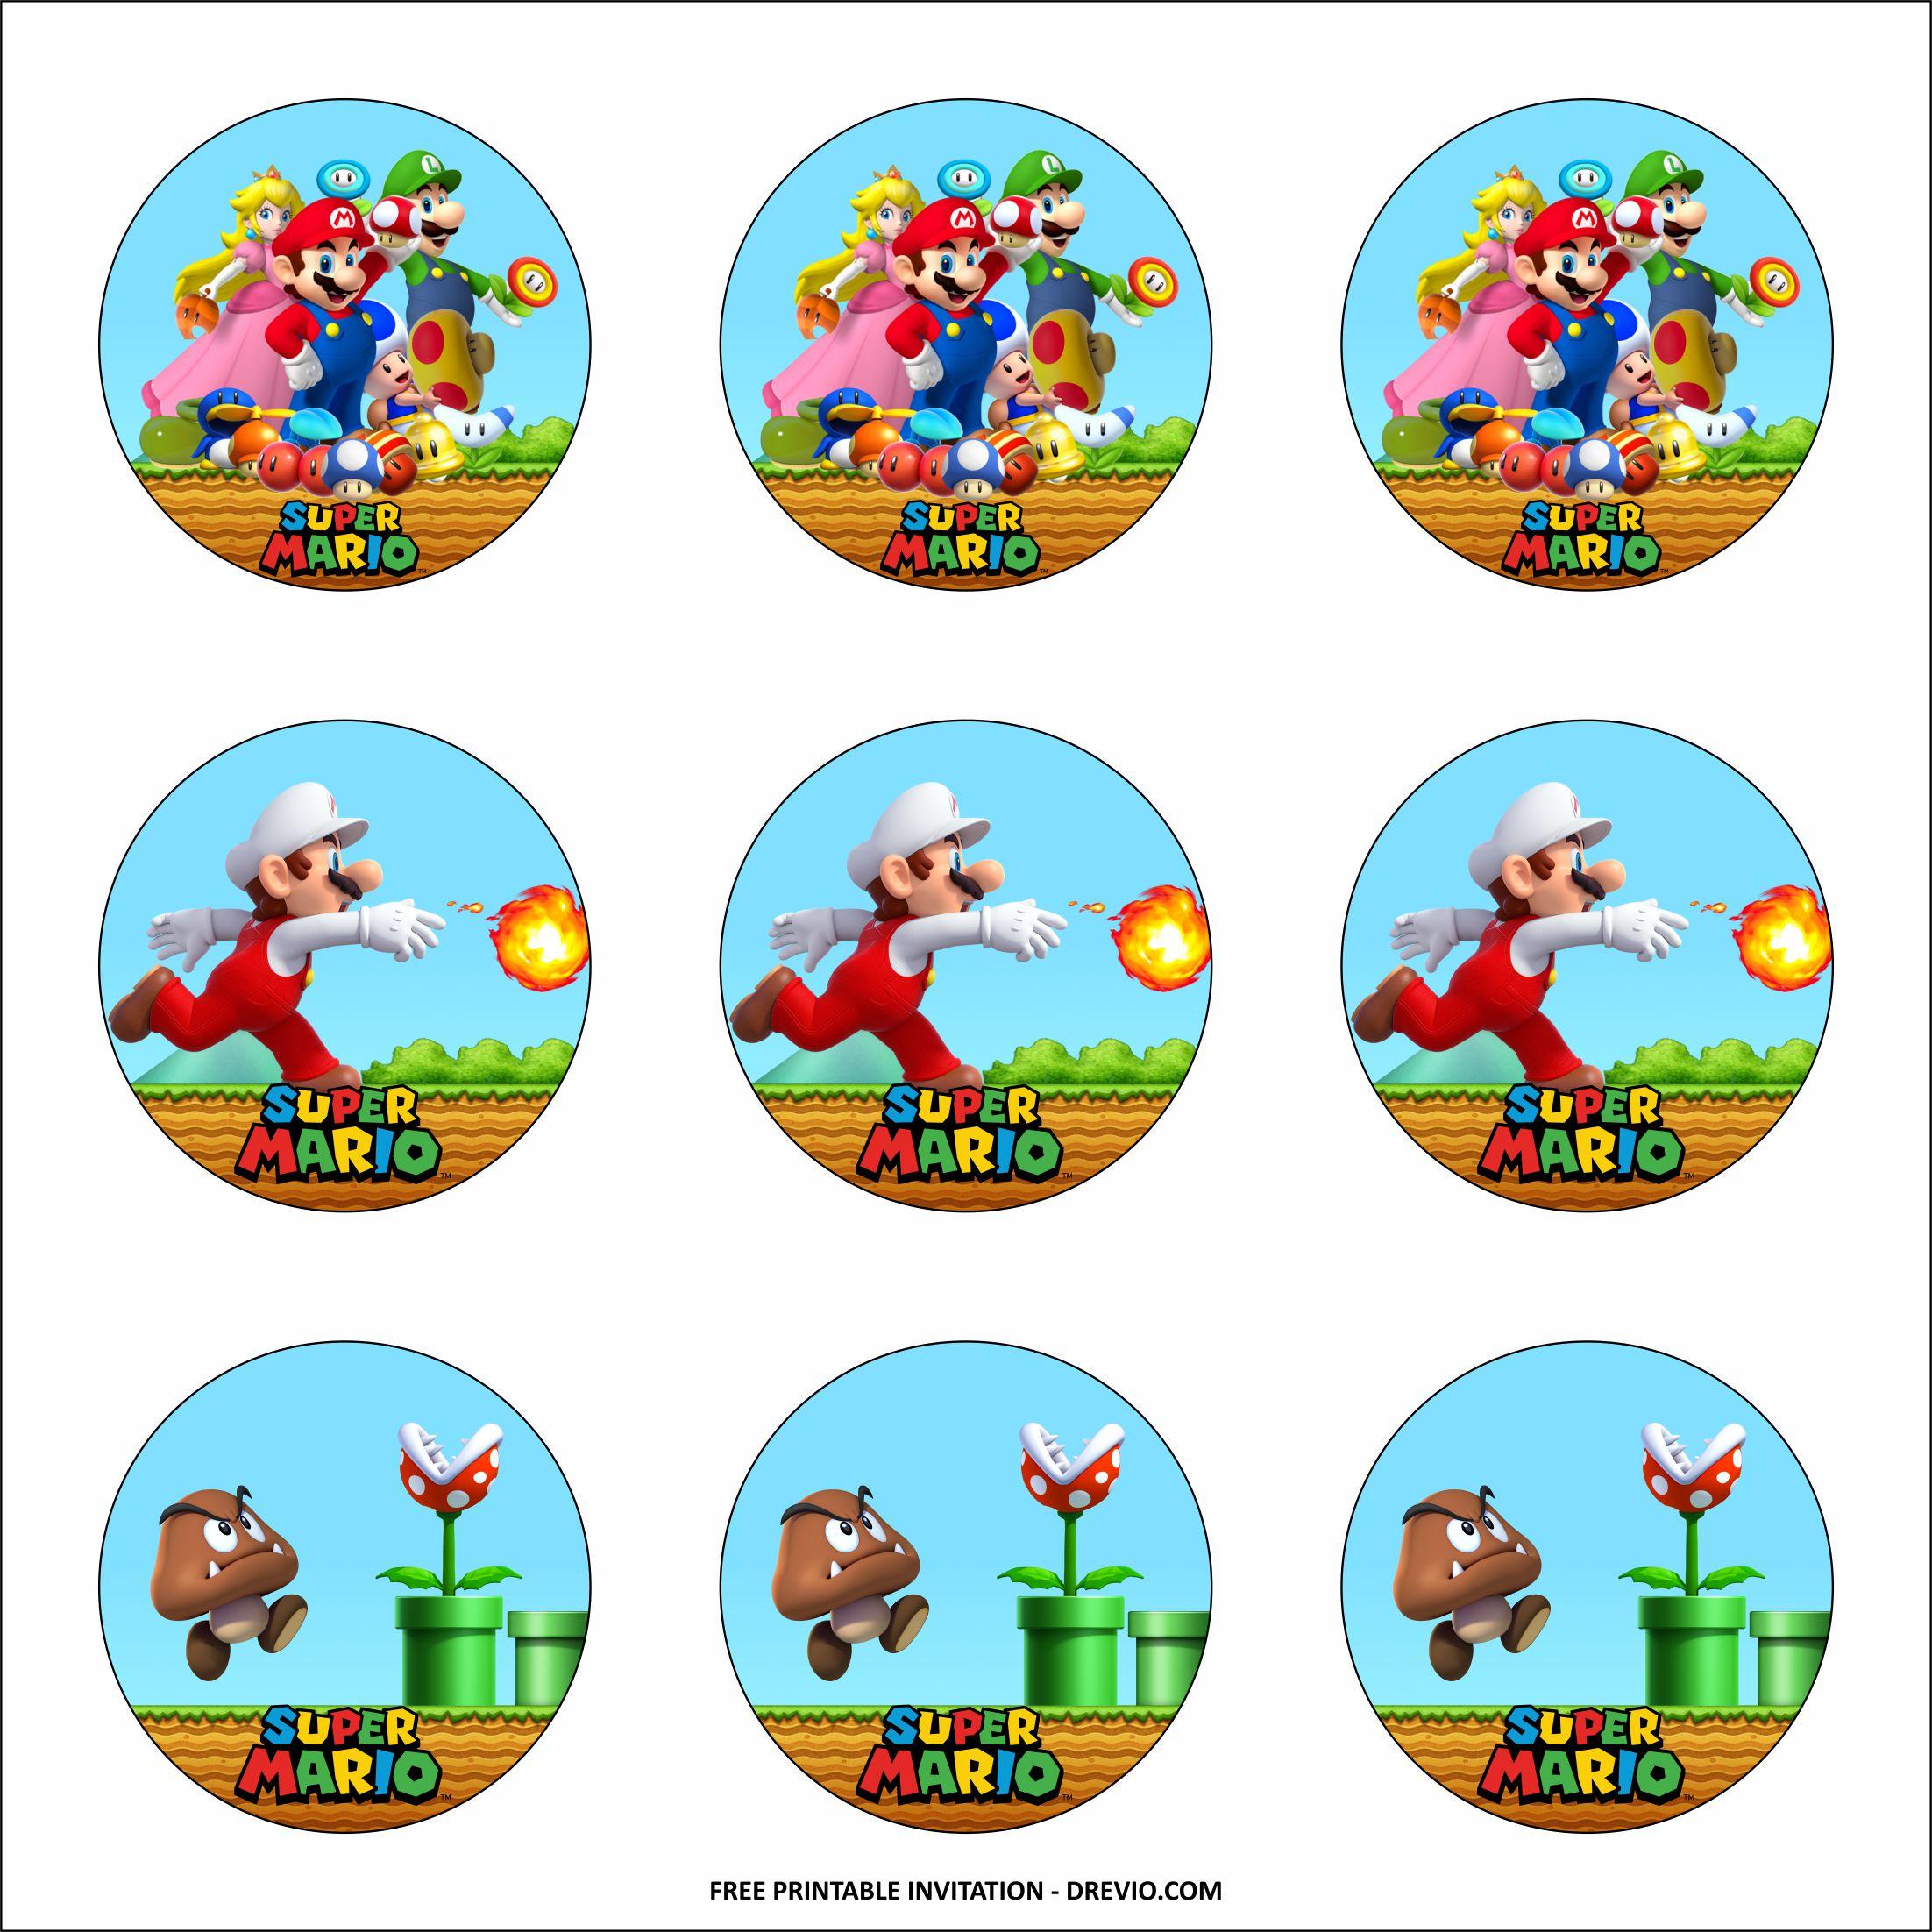 Free Printable Super Mario Themed Birthday Party Kits Template Download Hundreds Free Printable Birthday Invitation Templates